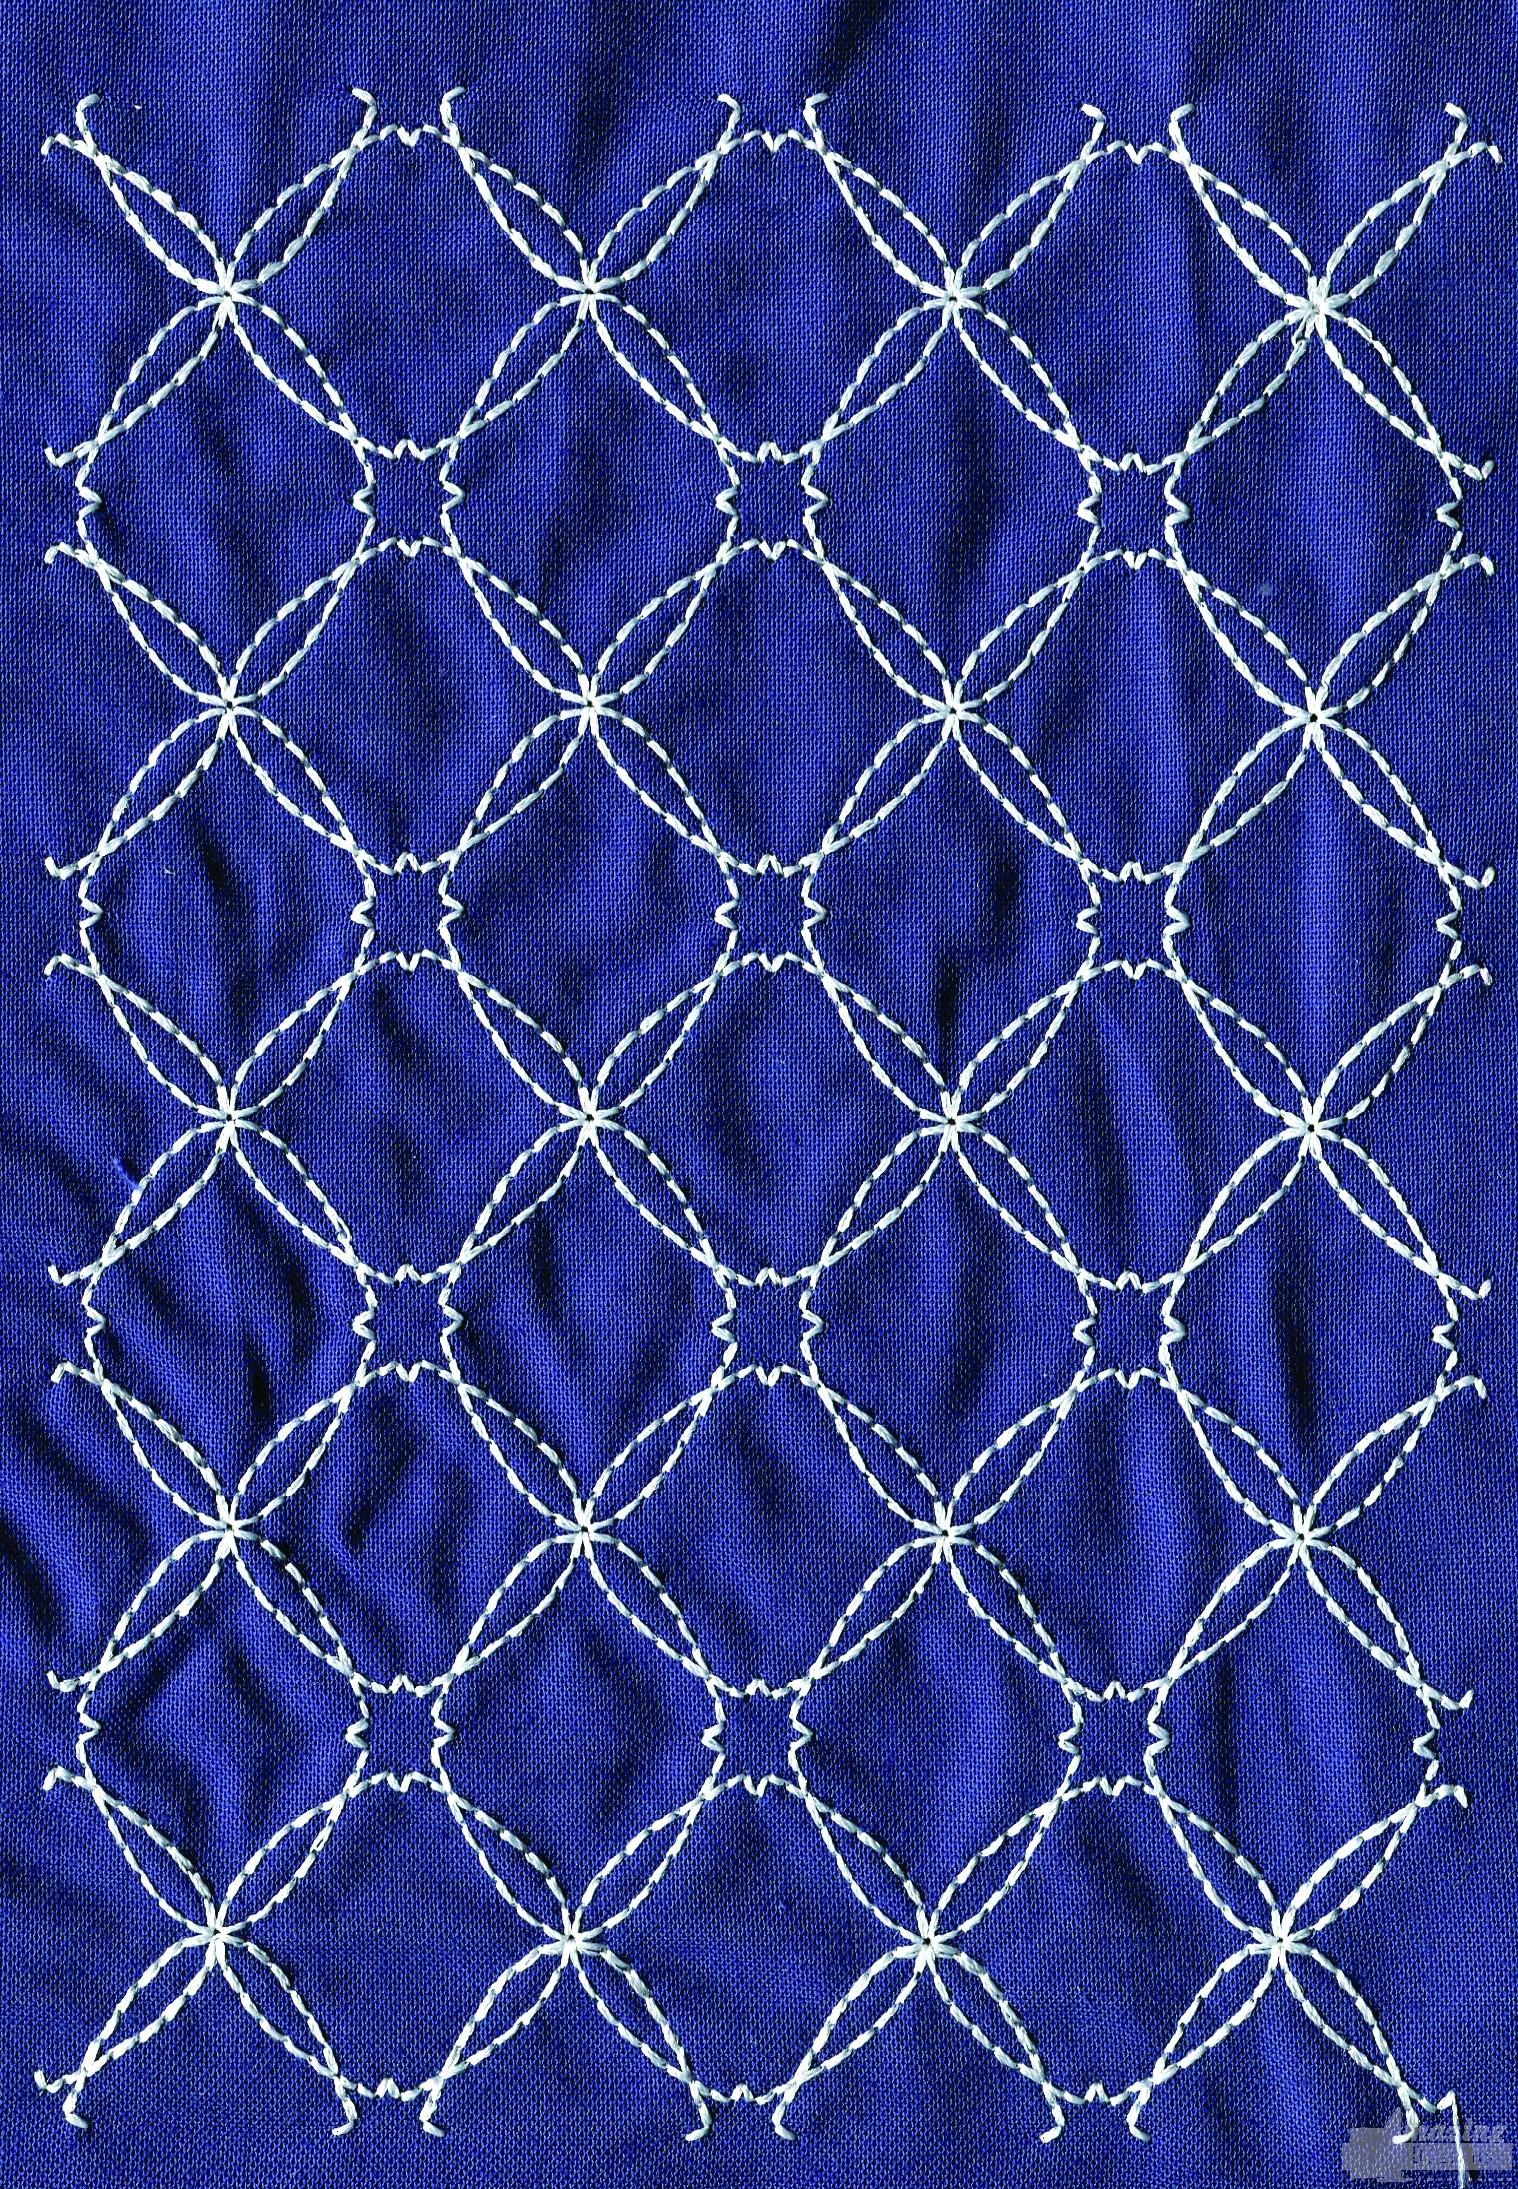 Sashiko Quilting Patterns Free : Sashiko Quilt Embroidery Design 2